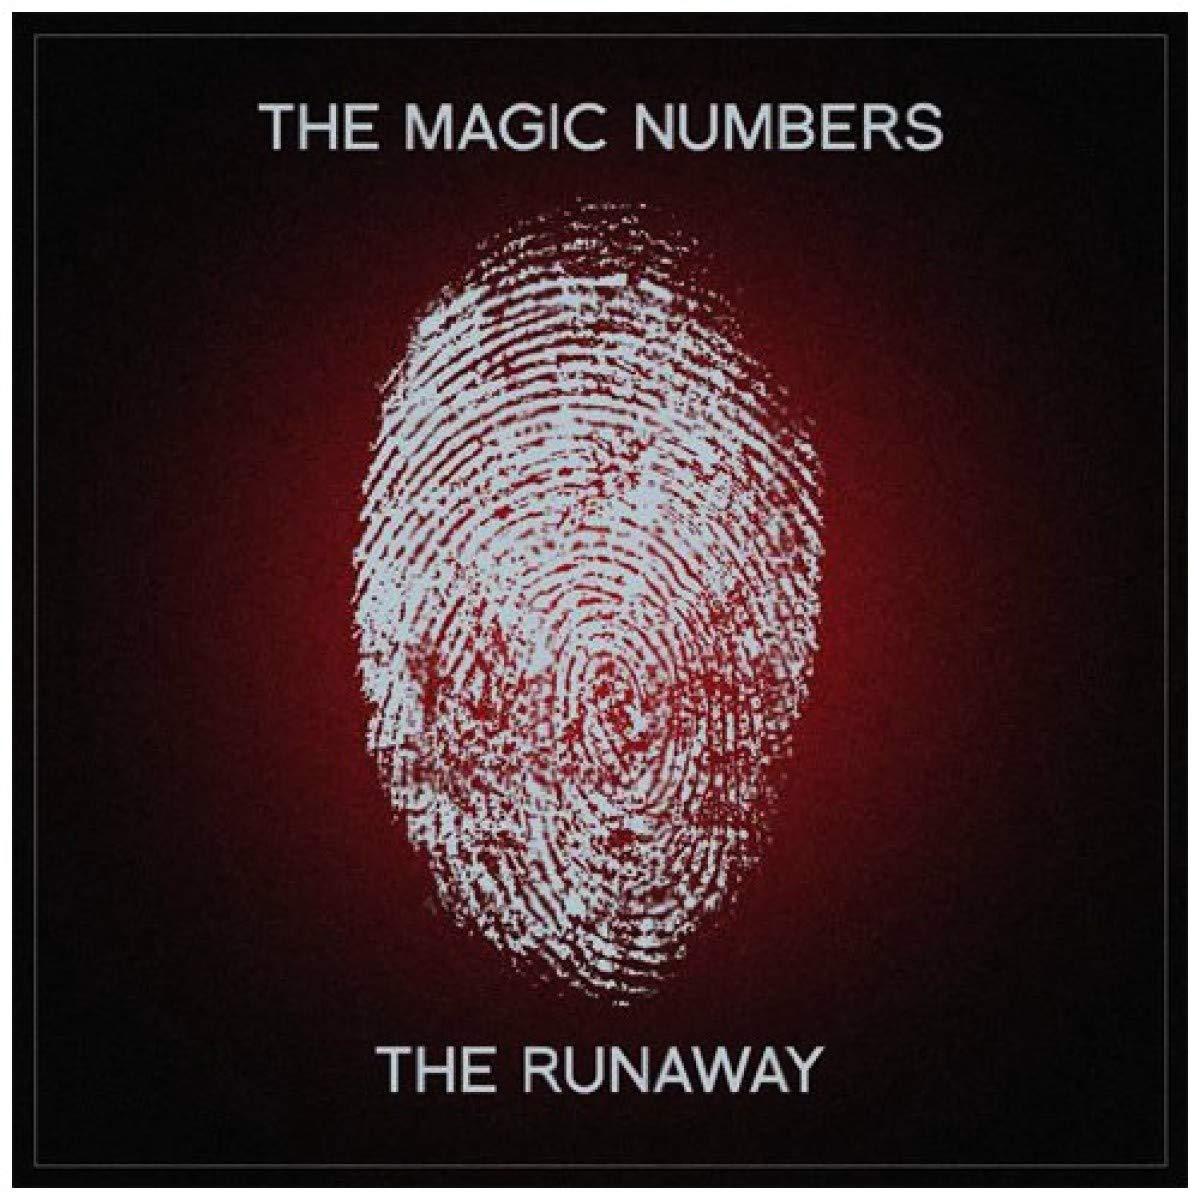 The Magic Numbers, The Runaway